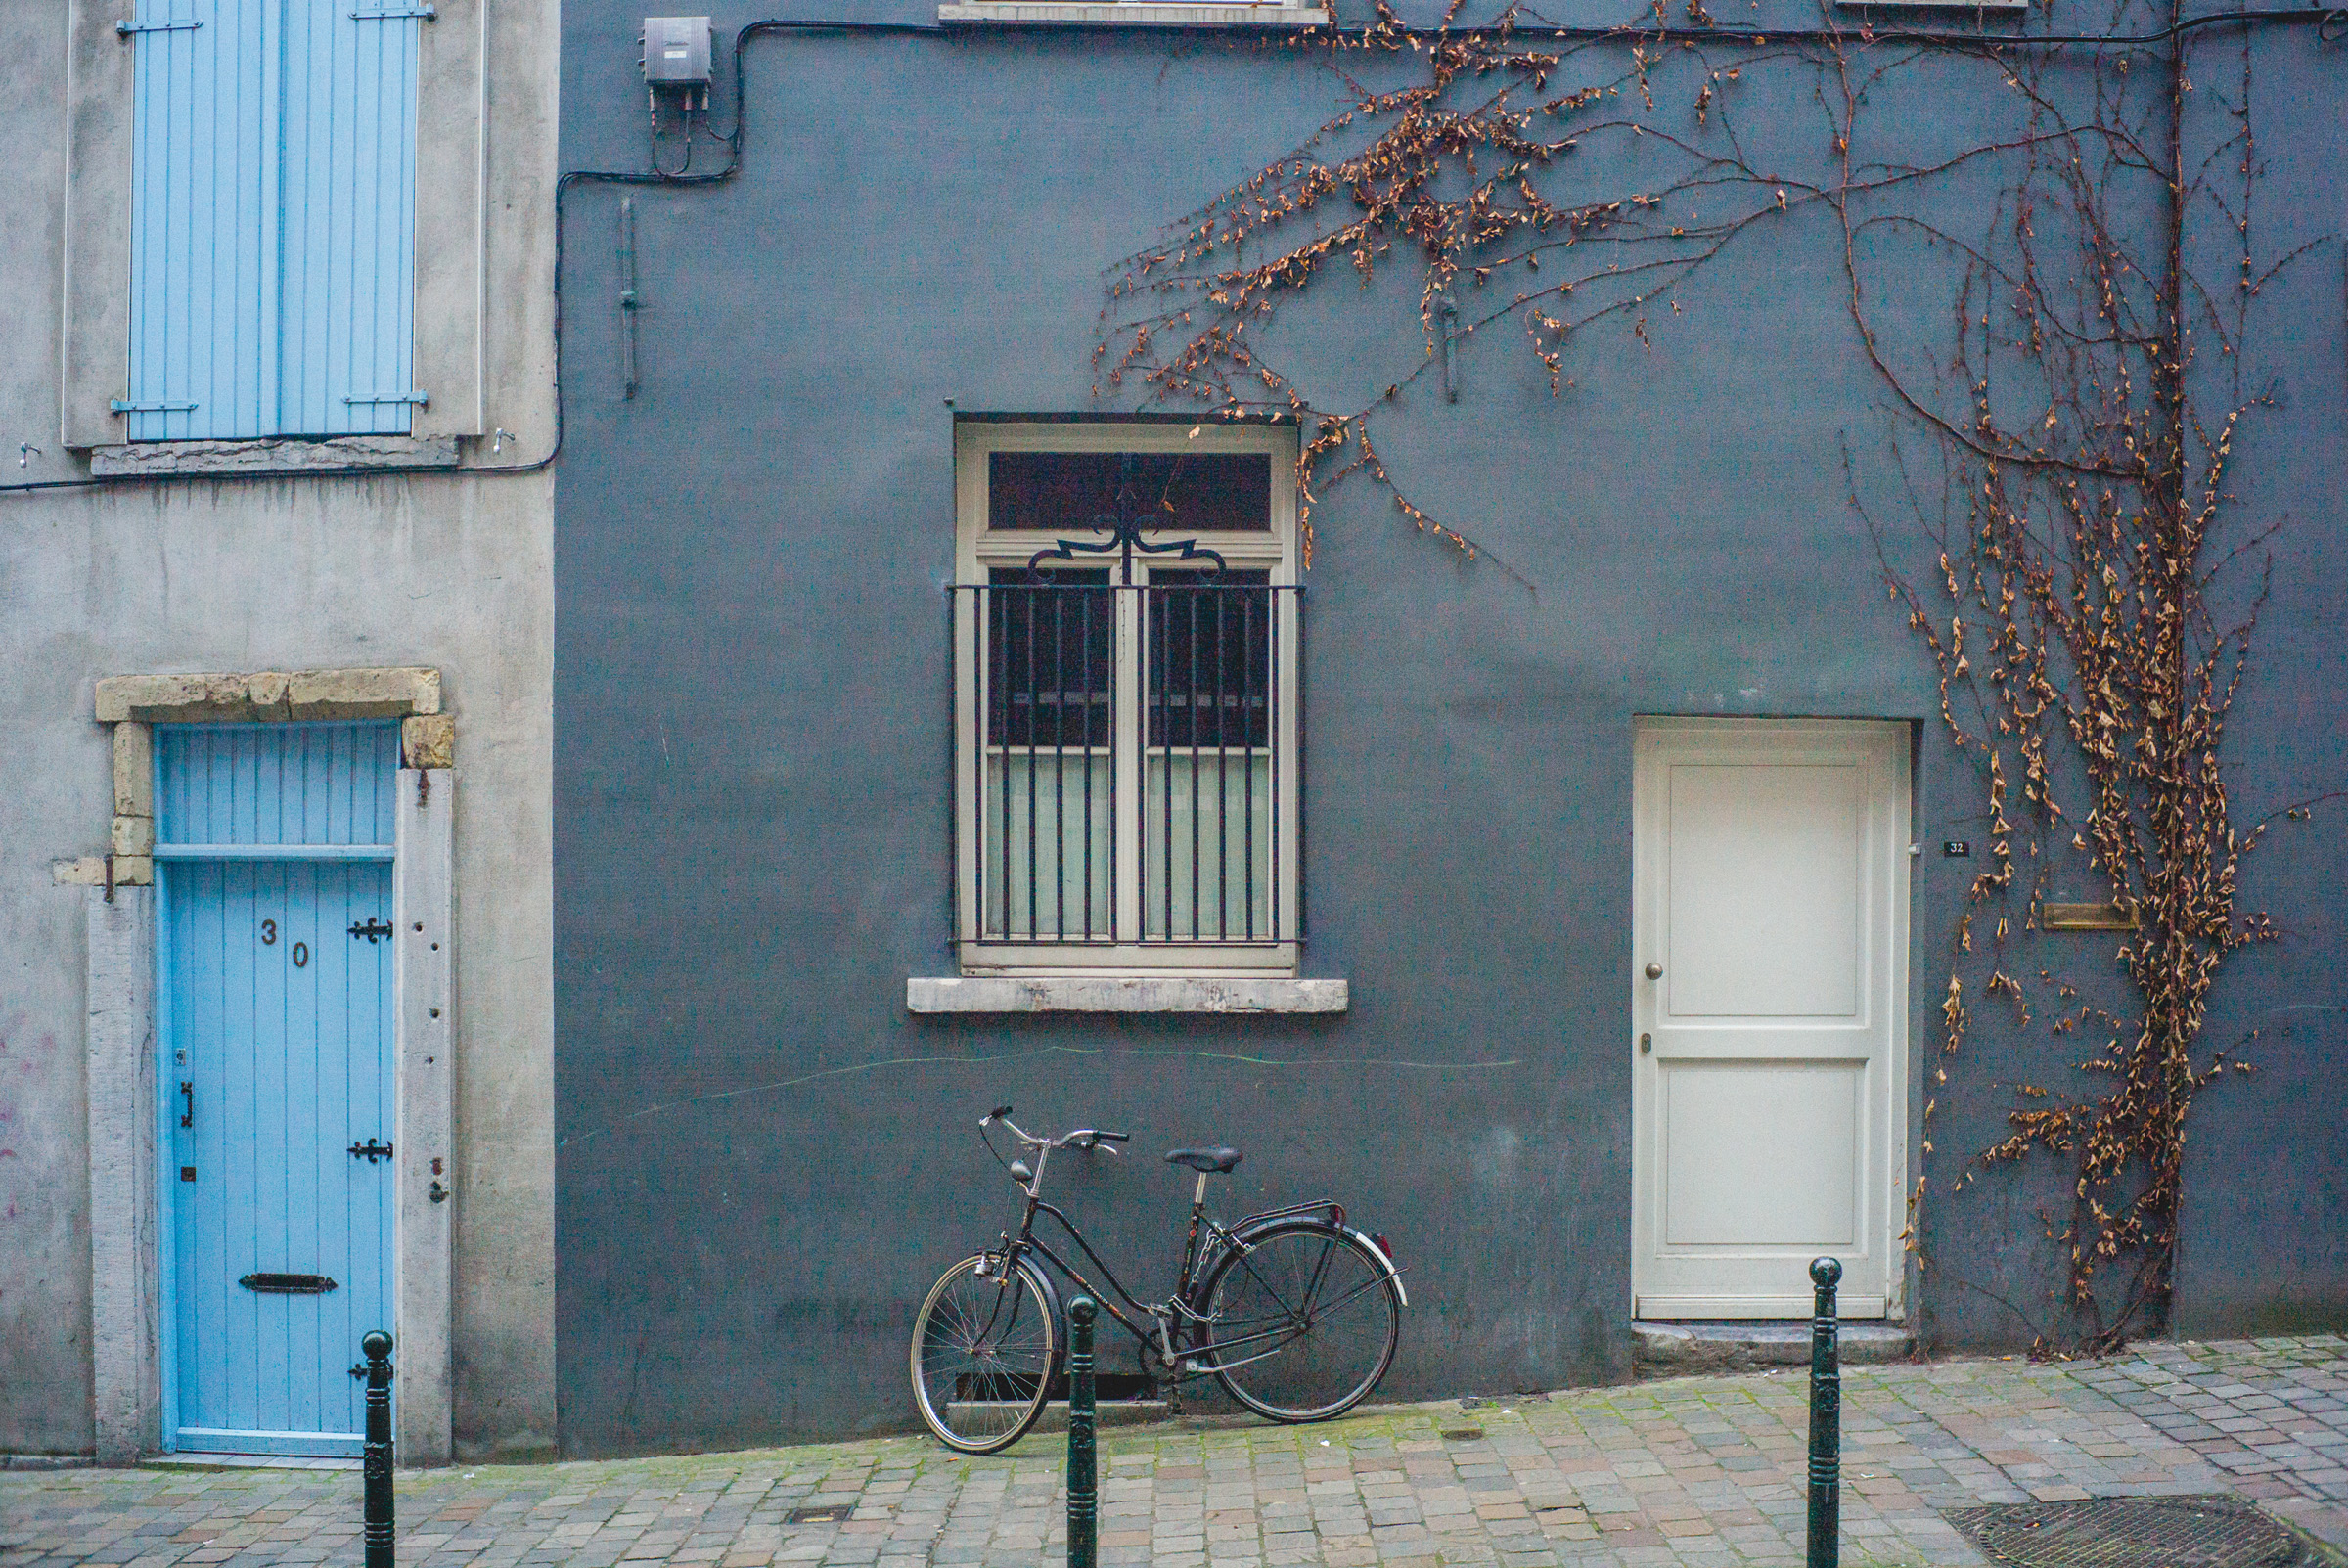 bruxelles-1007040.jpg